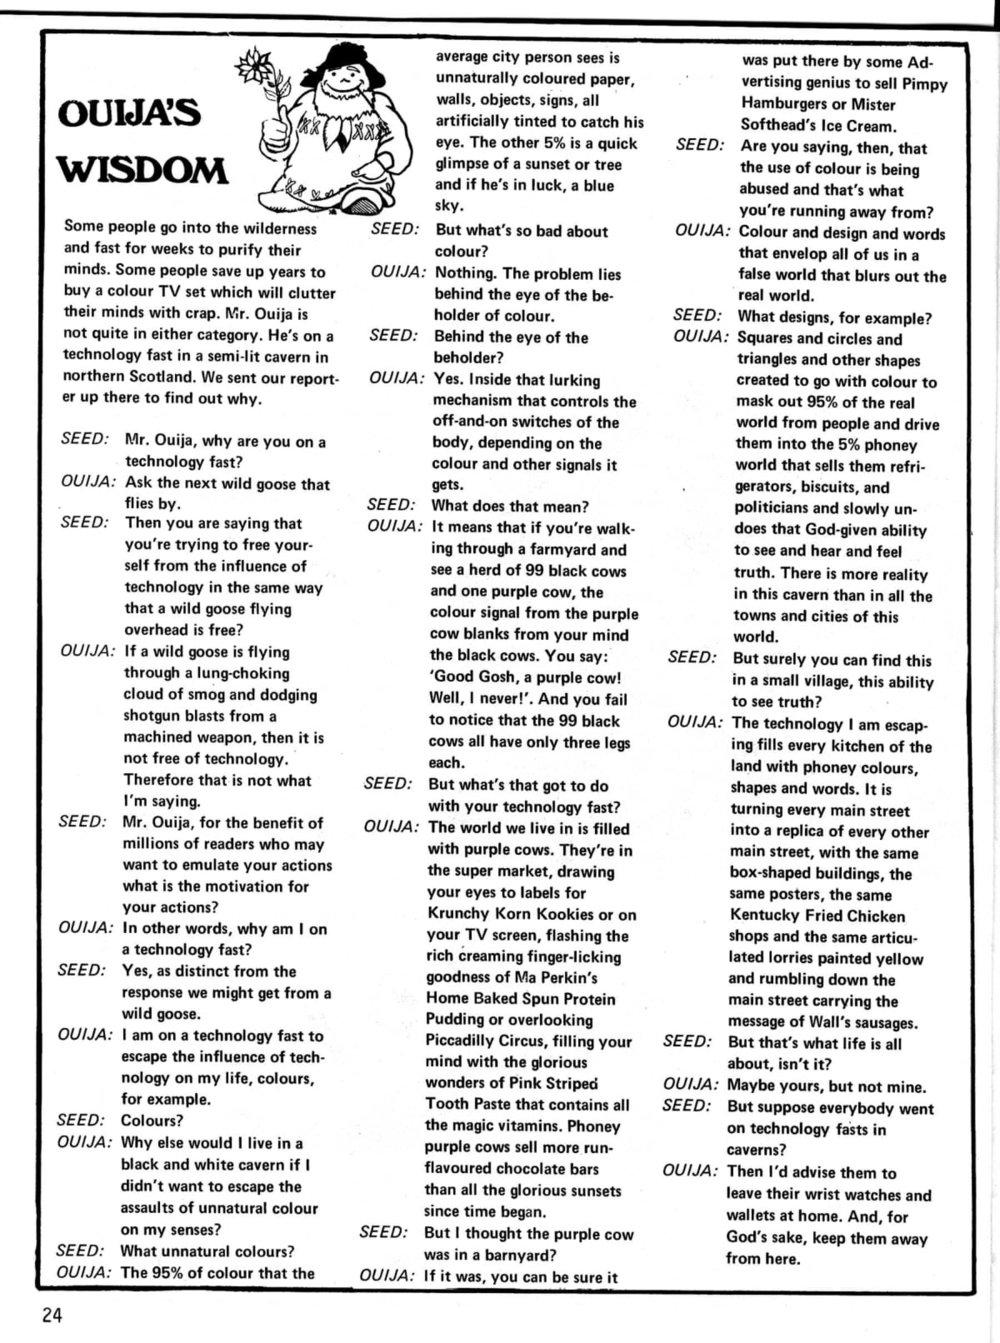 seed-v2-n4-april1973-24.jpg